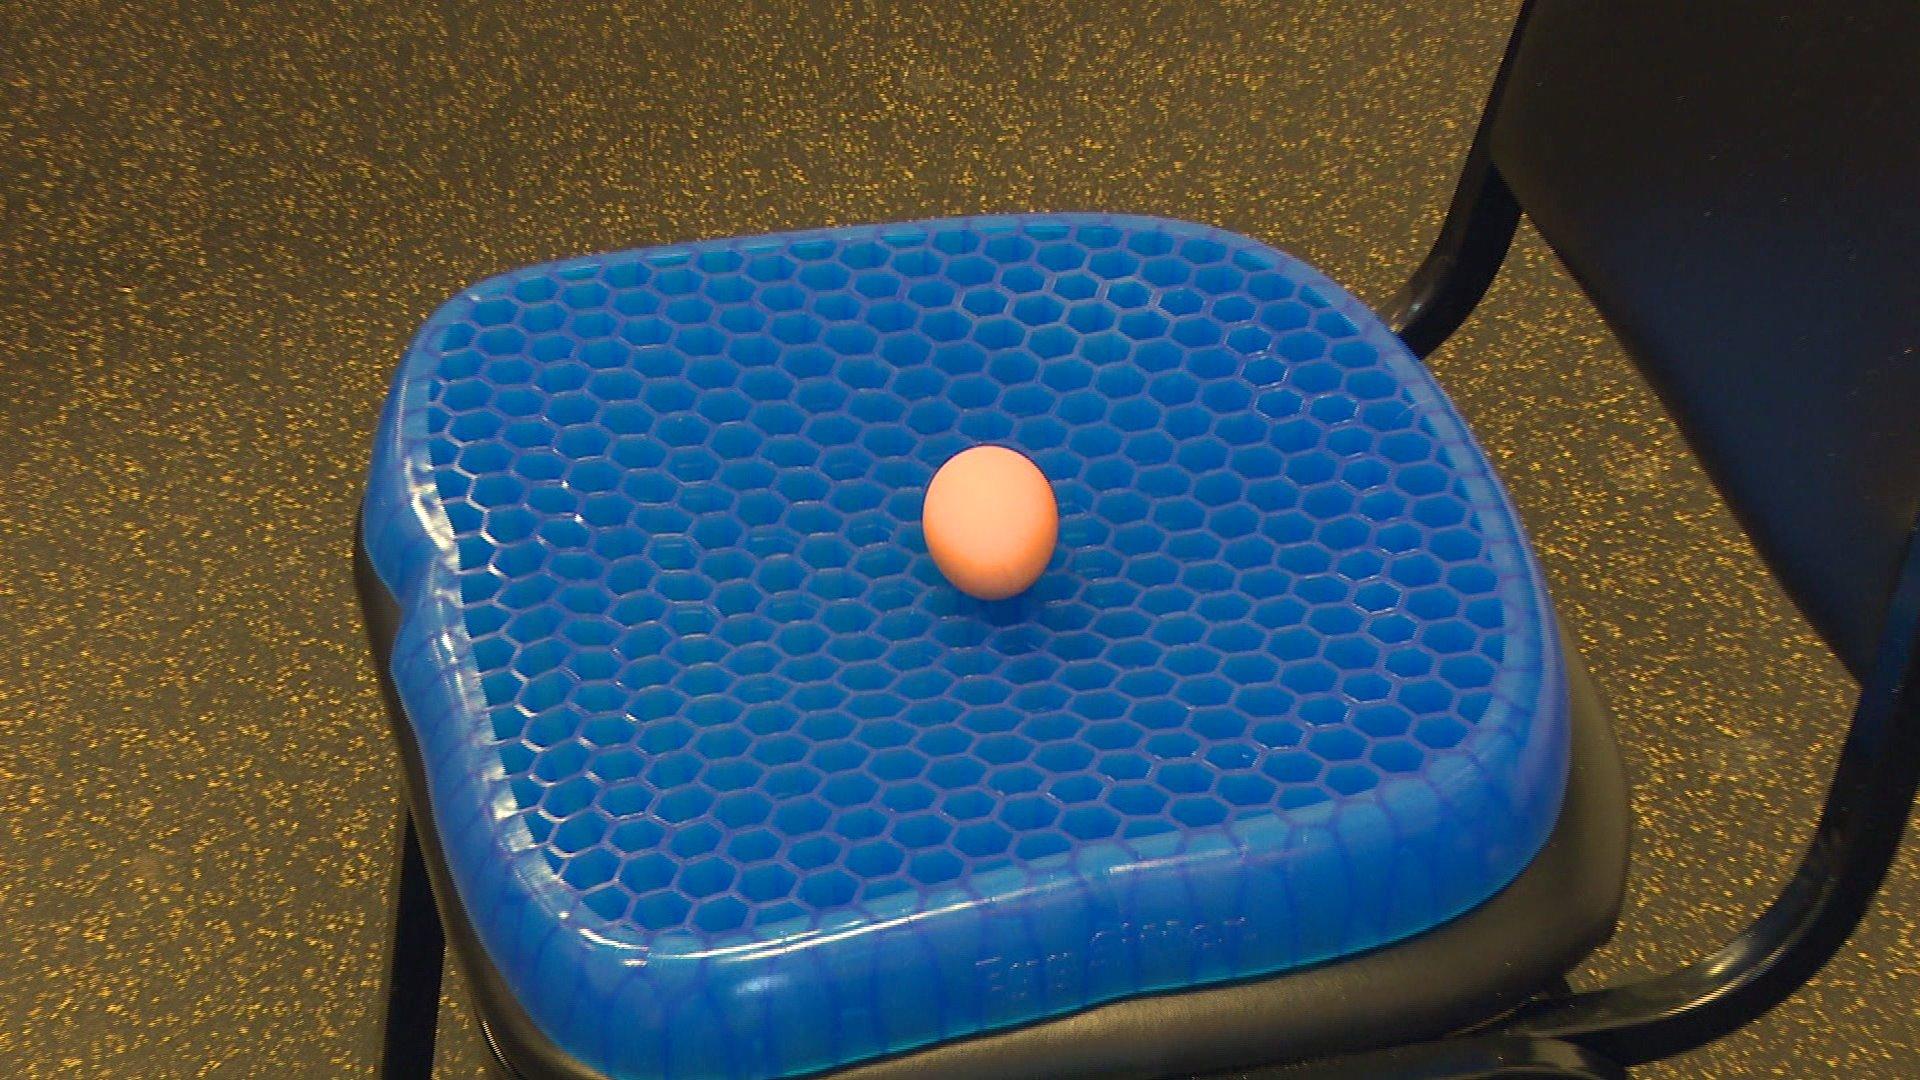 the egg sitter cushion